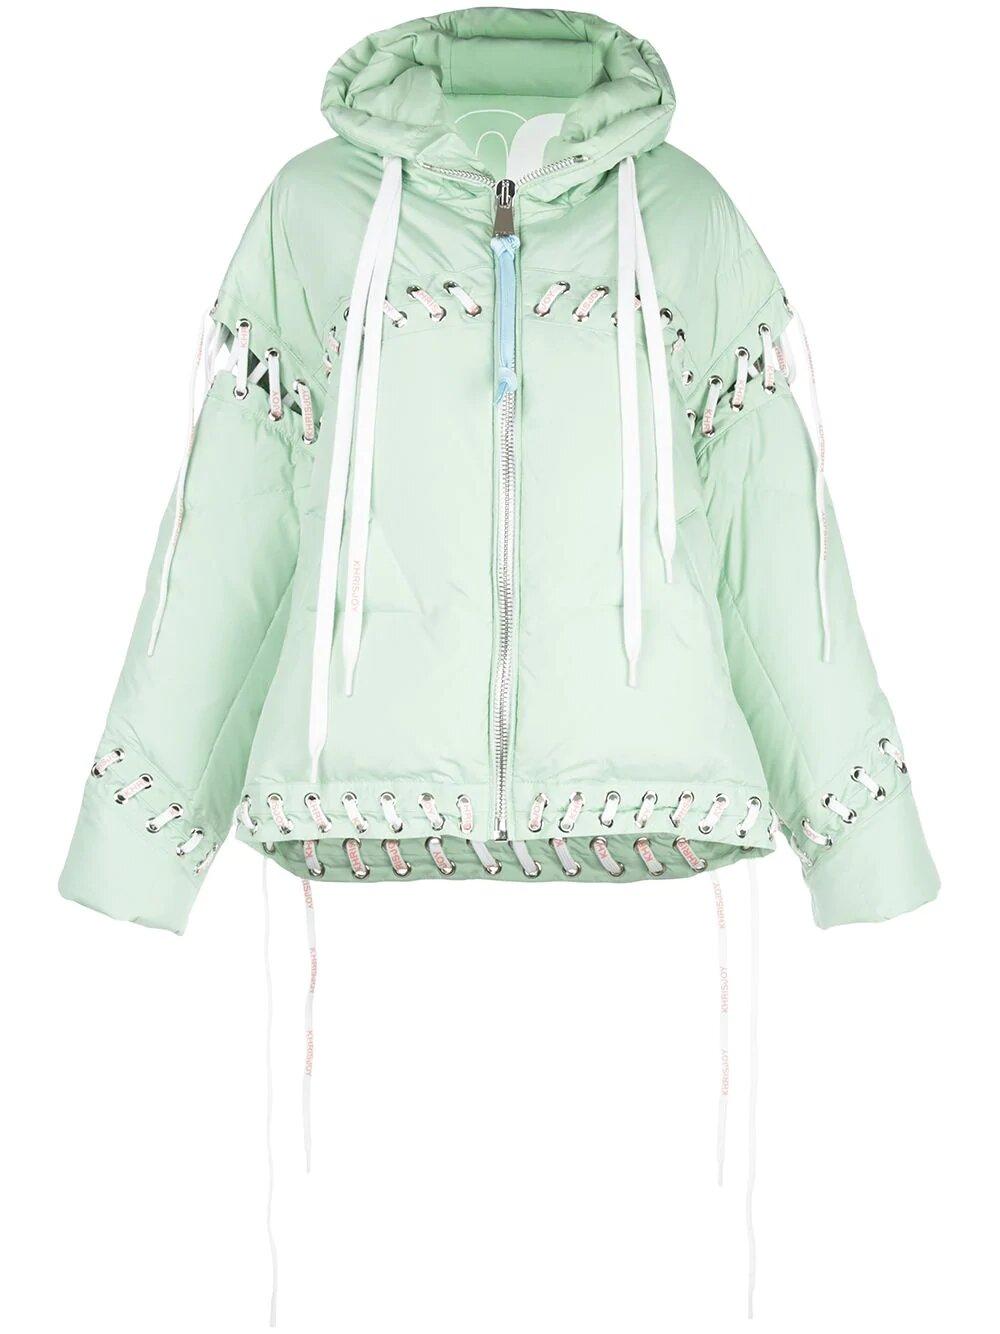 Khrisjoy, Сontrast lace-up puffer jacket 4953лв